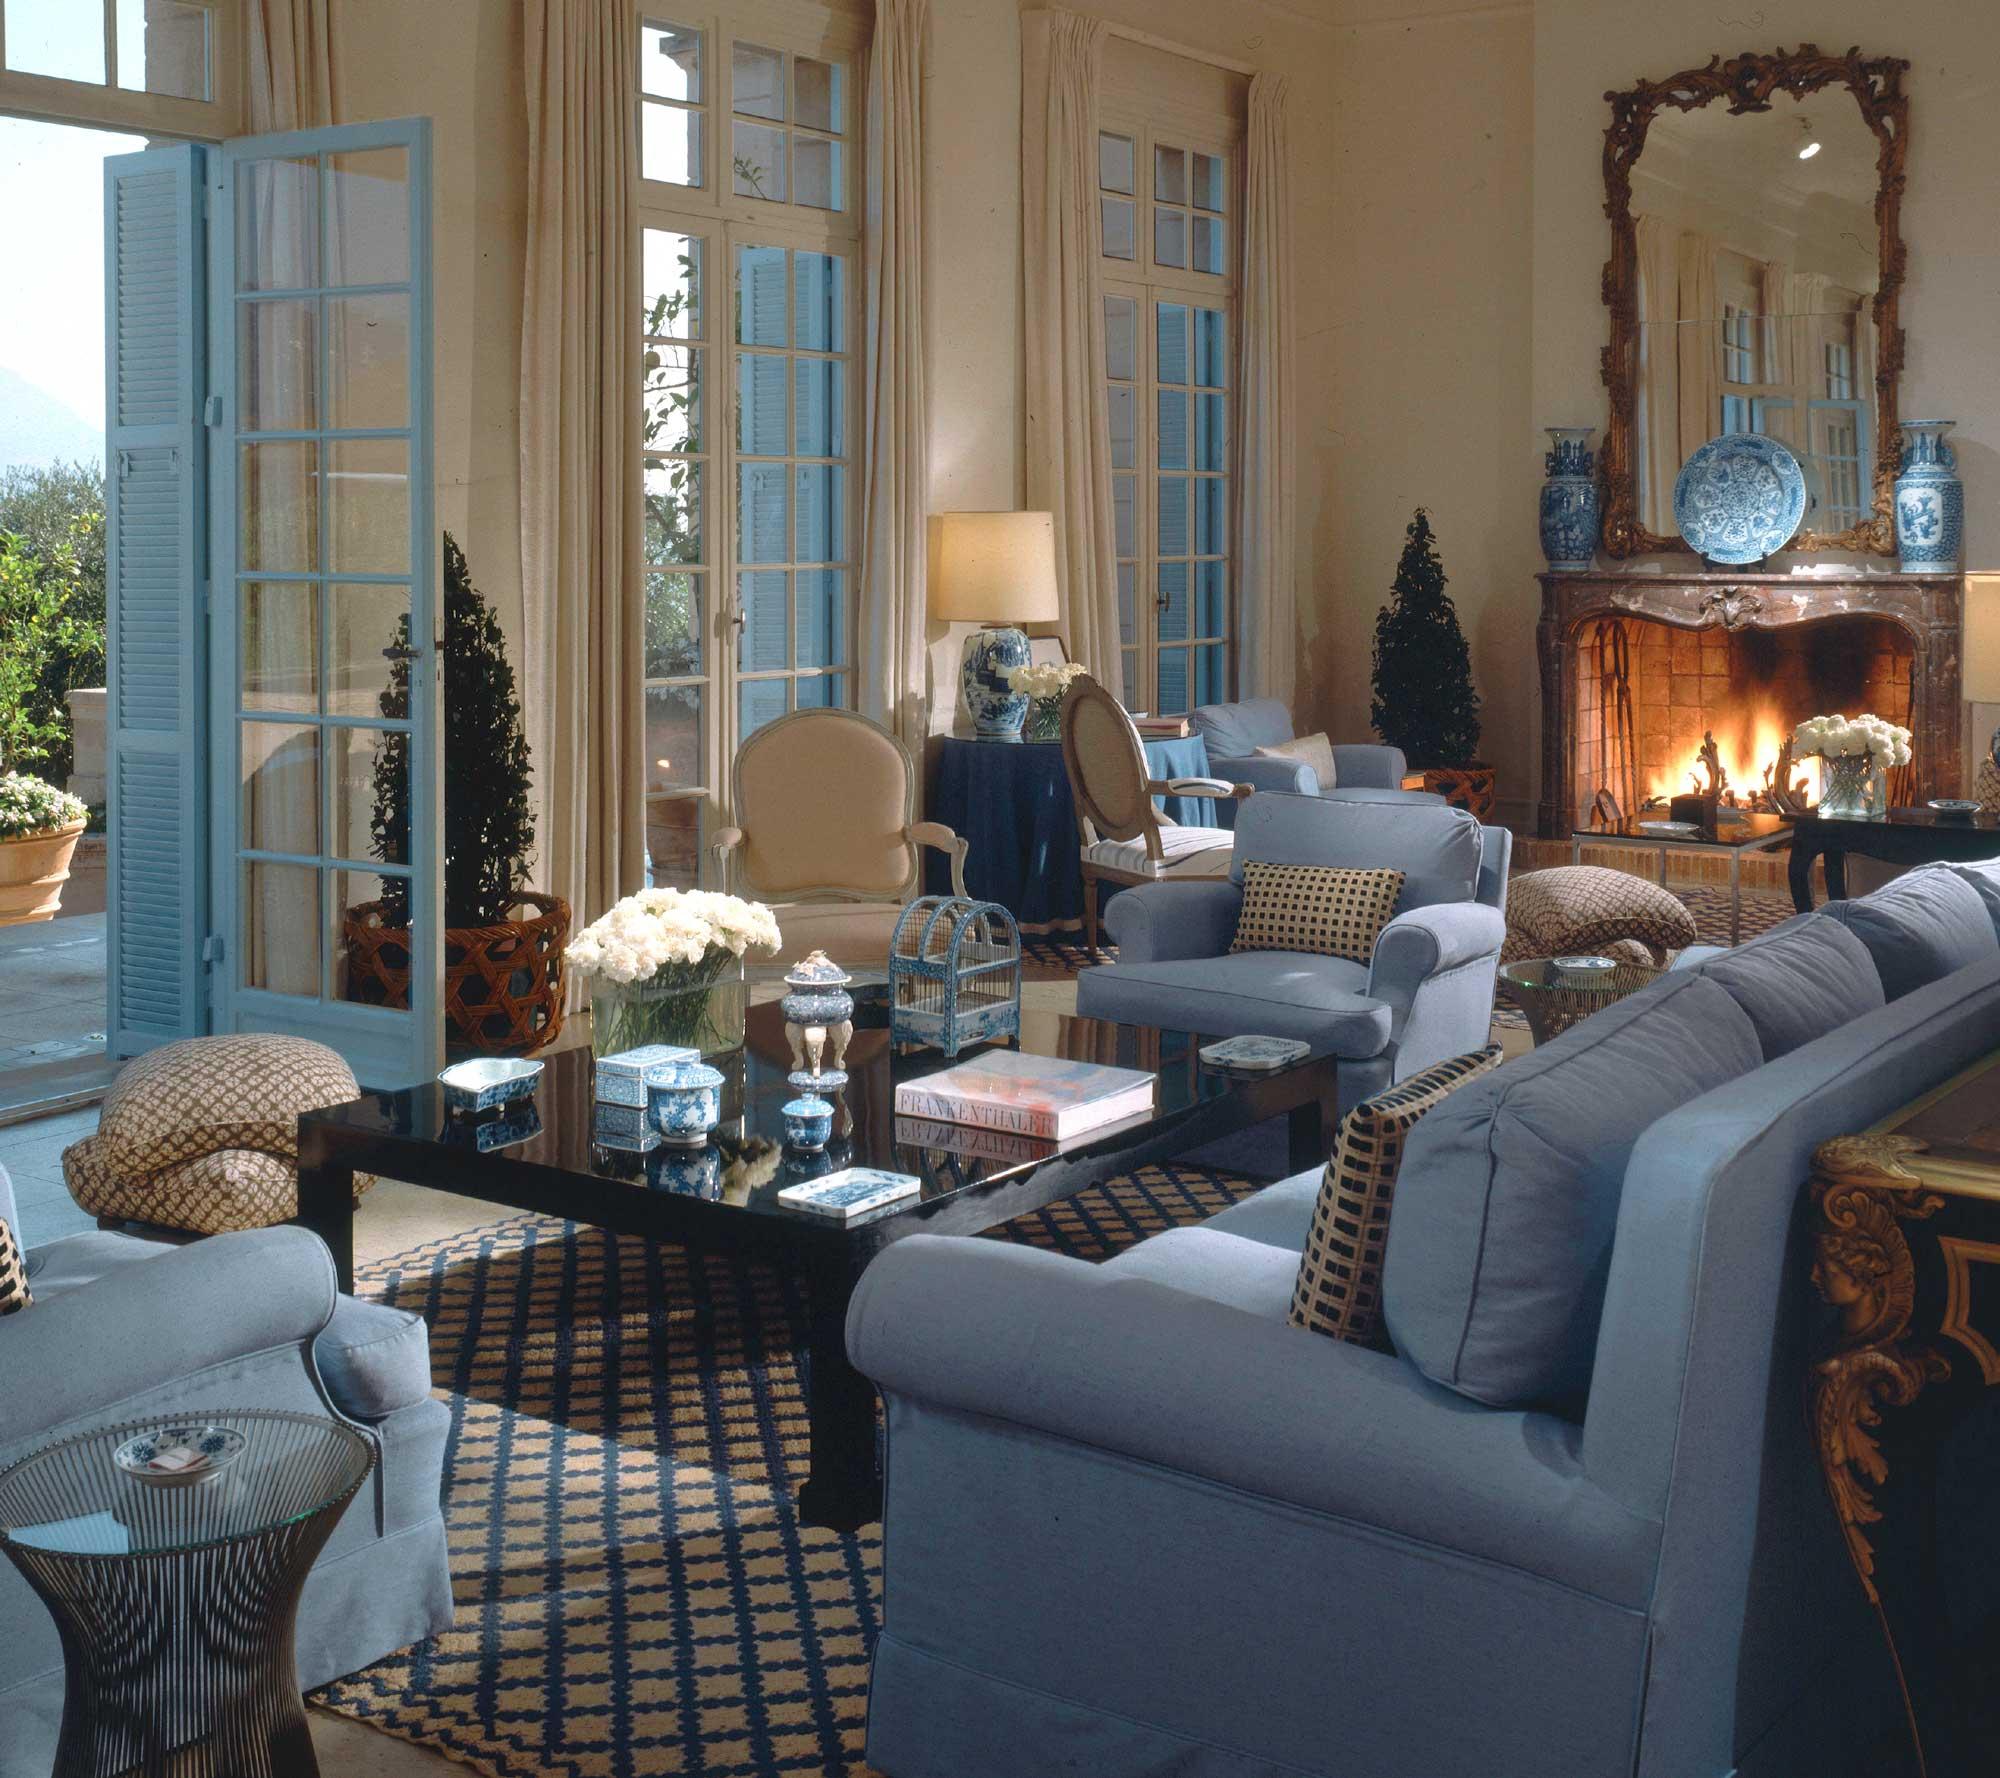 Incroyable La Fiorentina Salon As Designed By Billy Baldwin